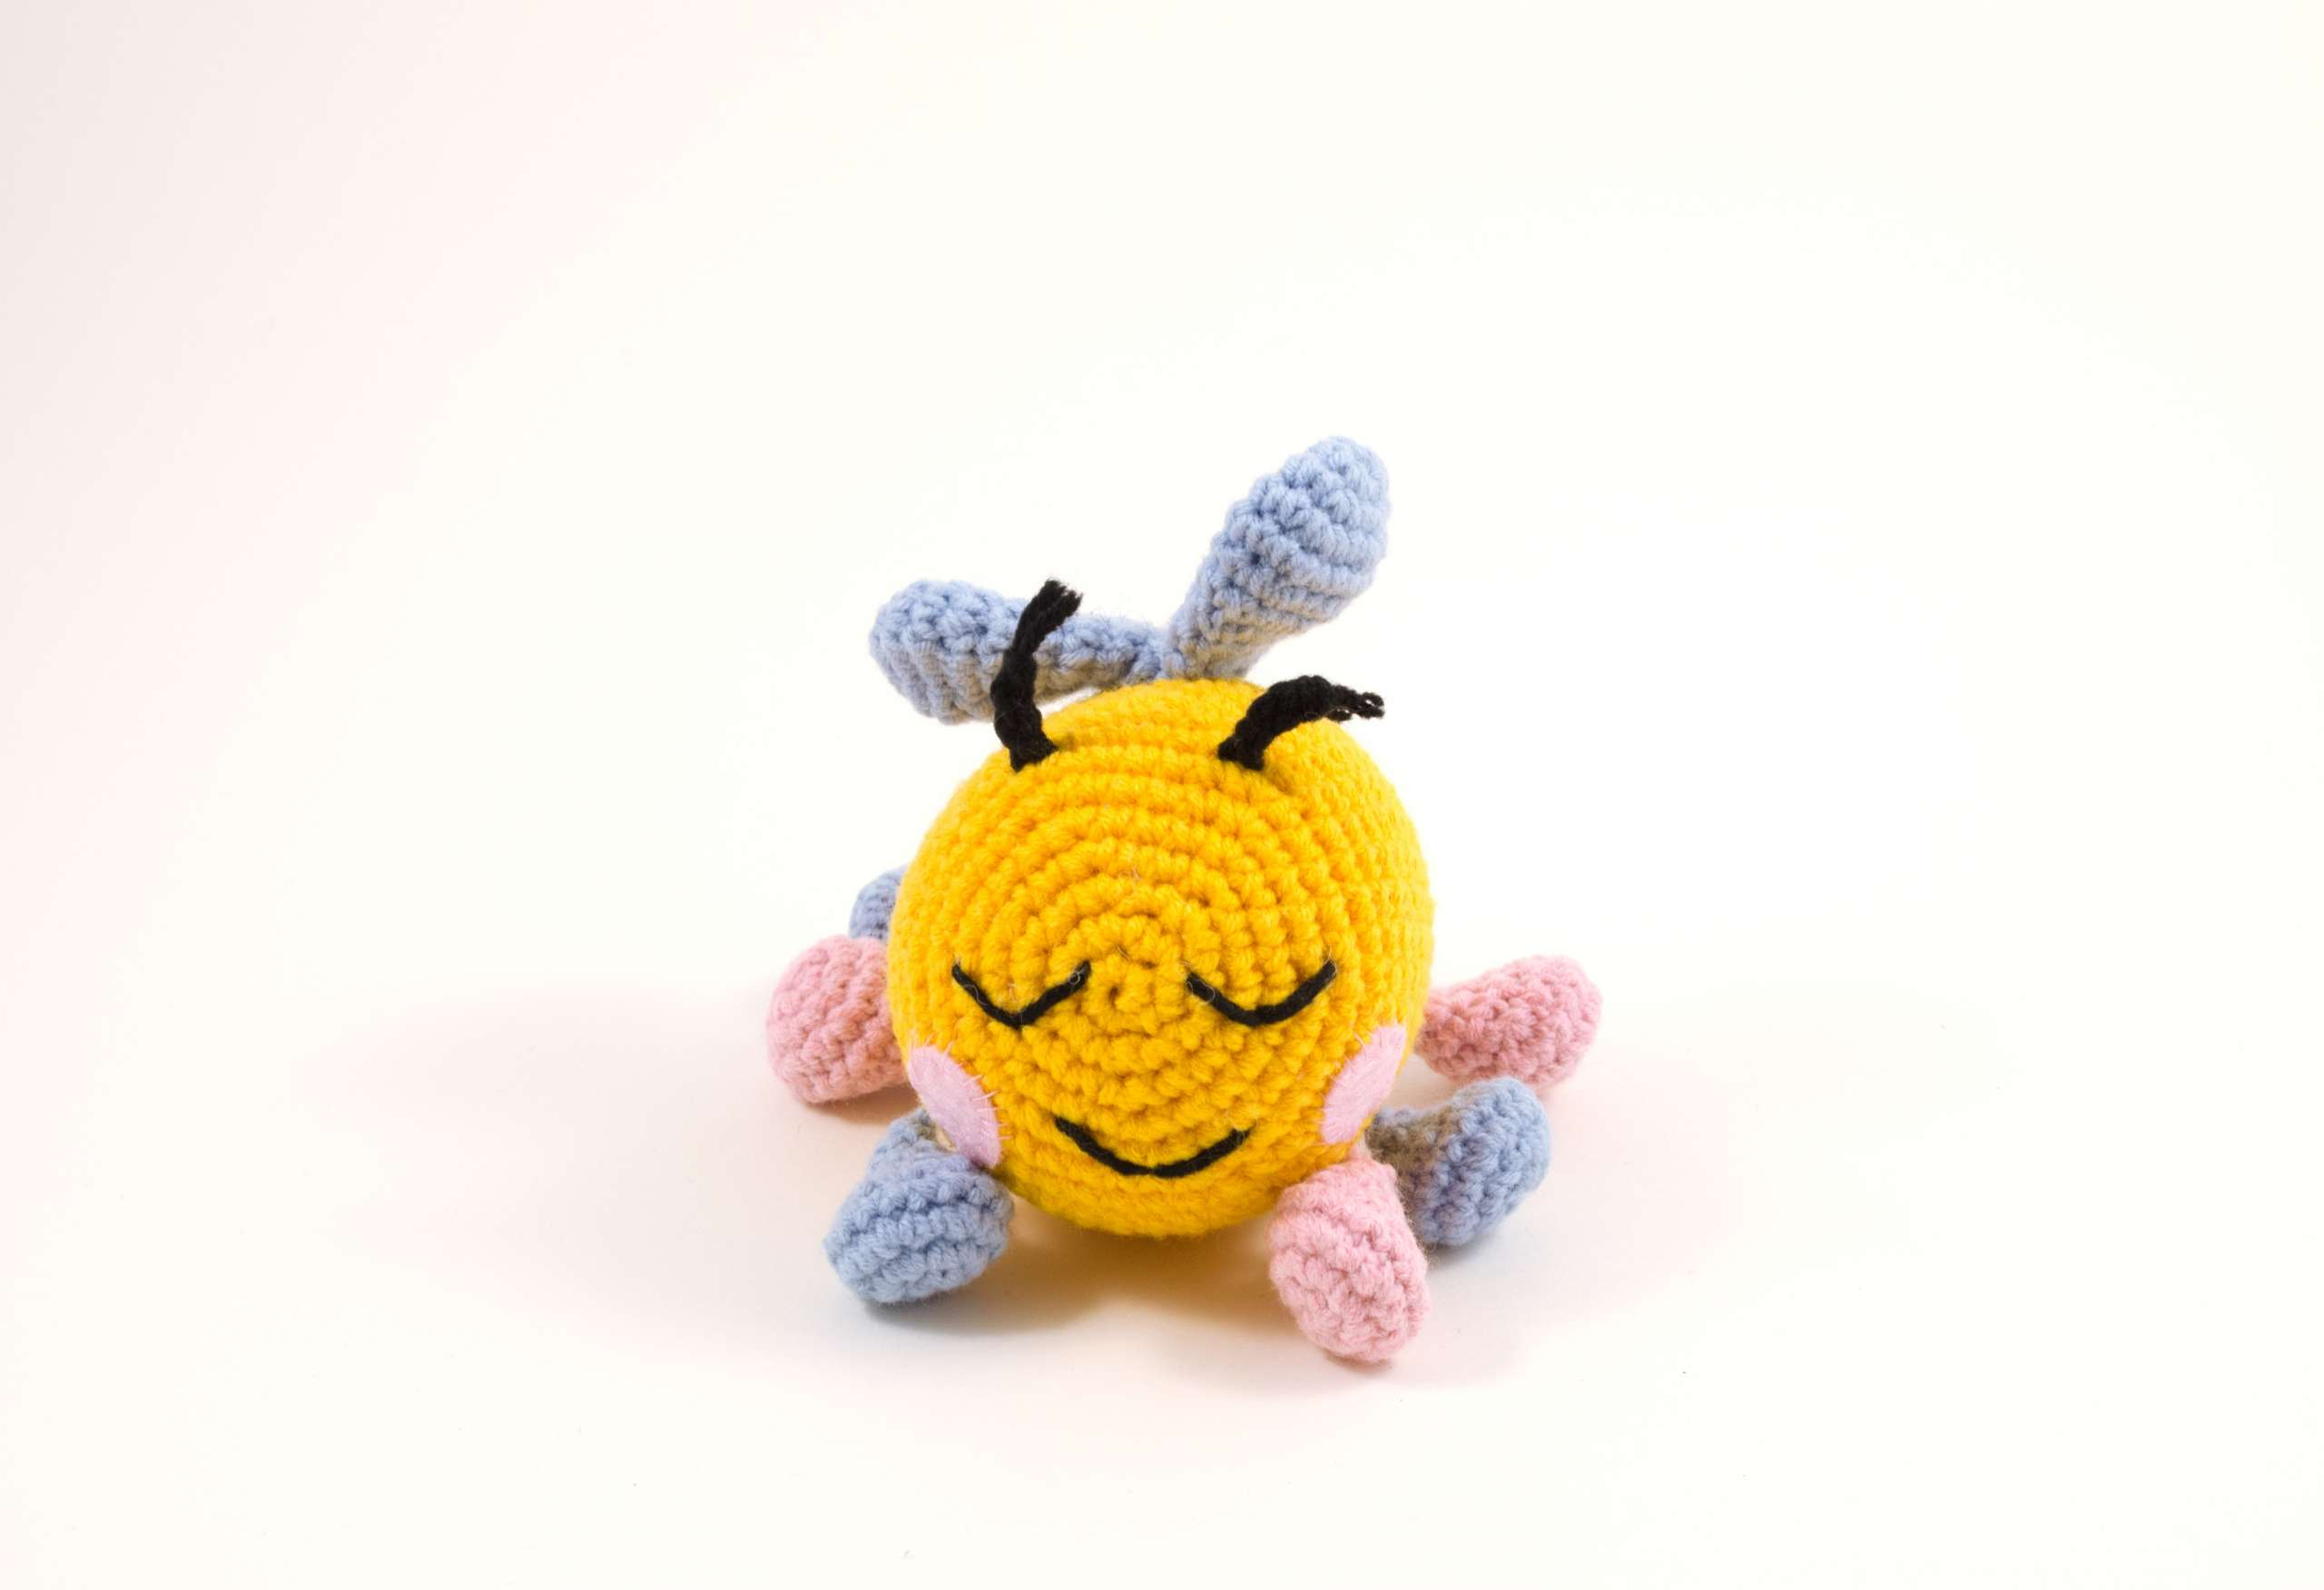 crochet bibi the bee front view